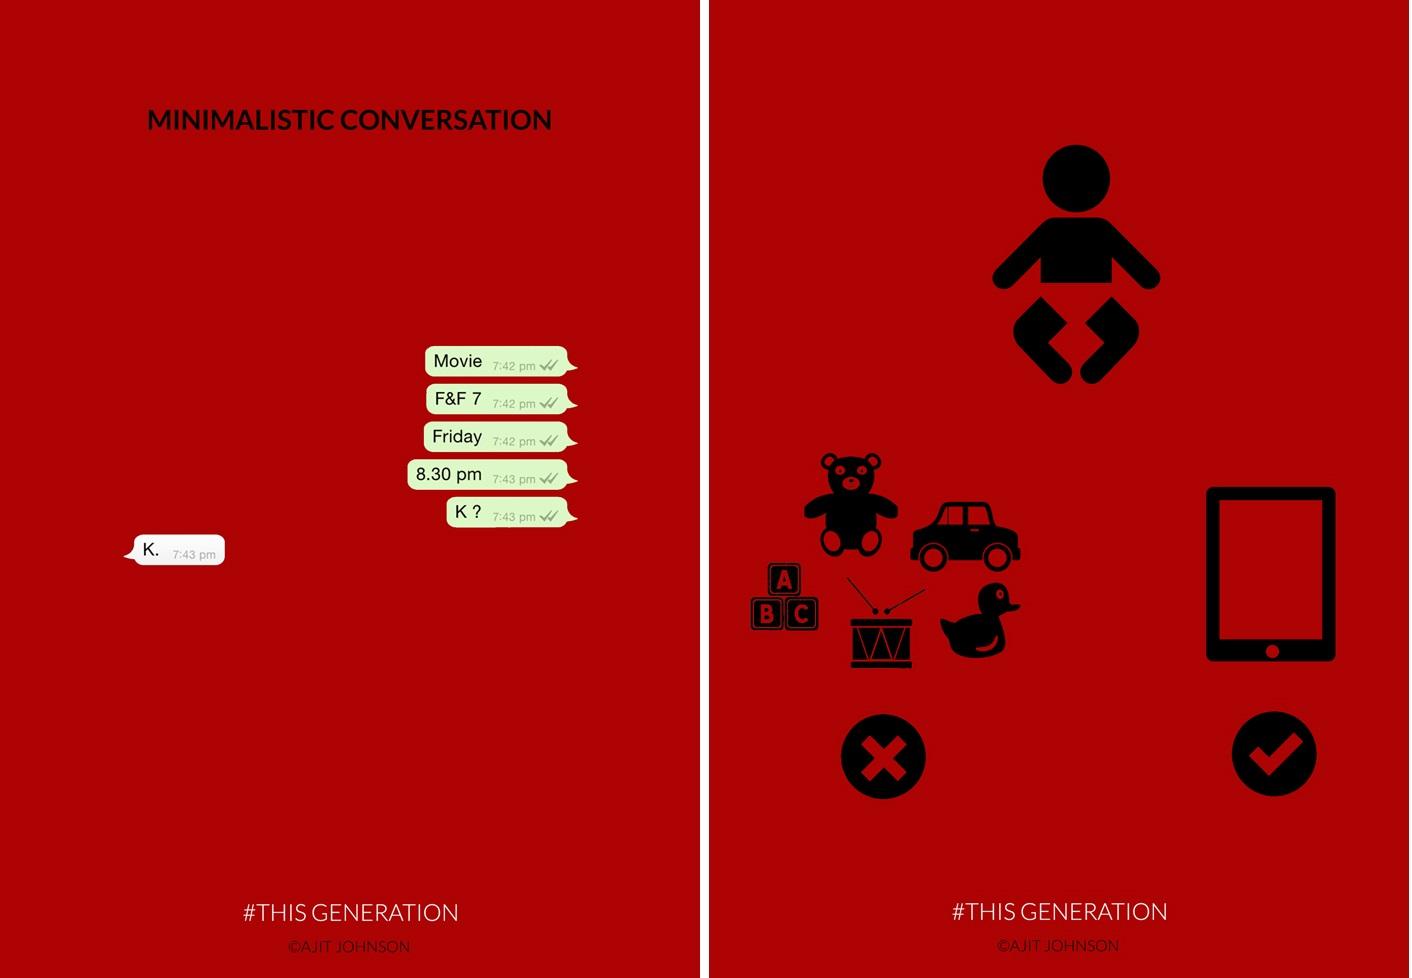 this-generation-satirical-illustrations-ajit-johnson-29__700 2